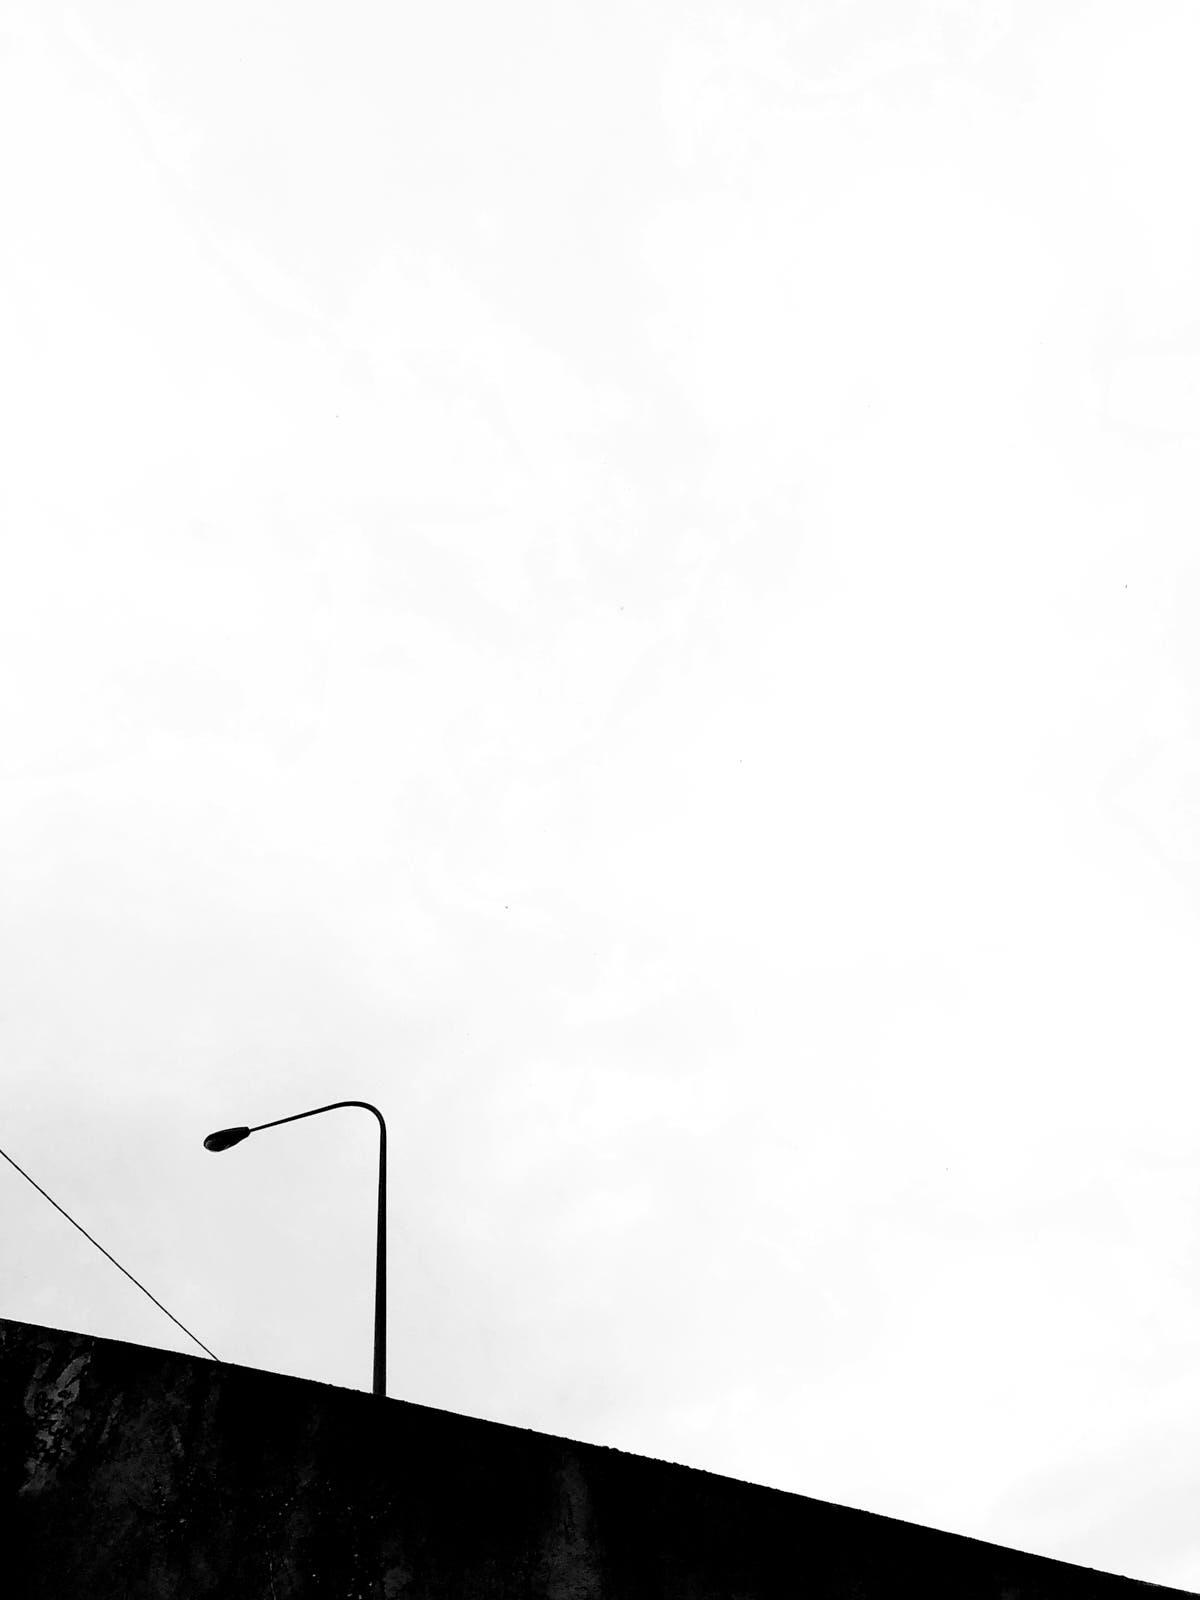 minimalist photography of a street lamp